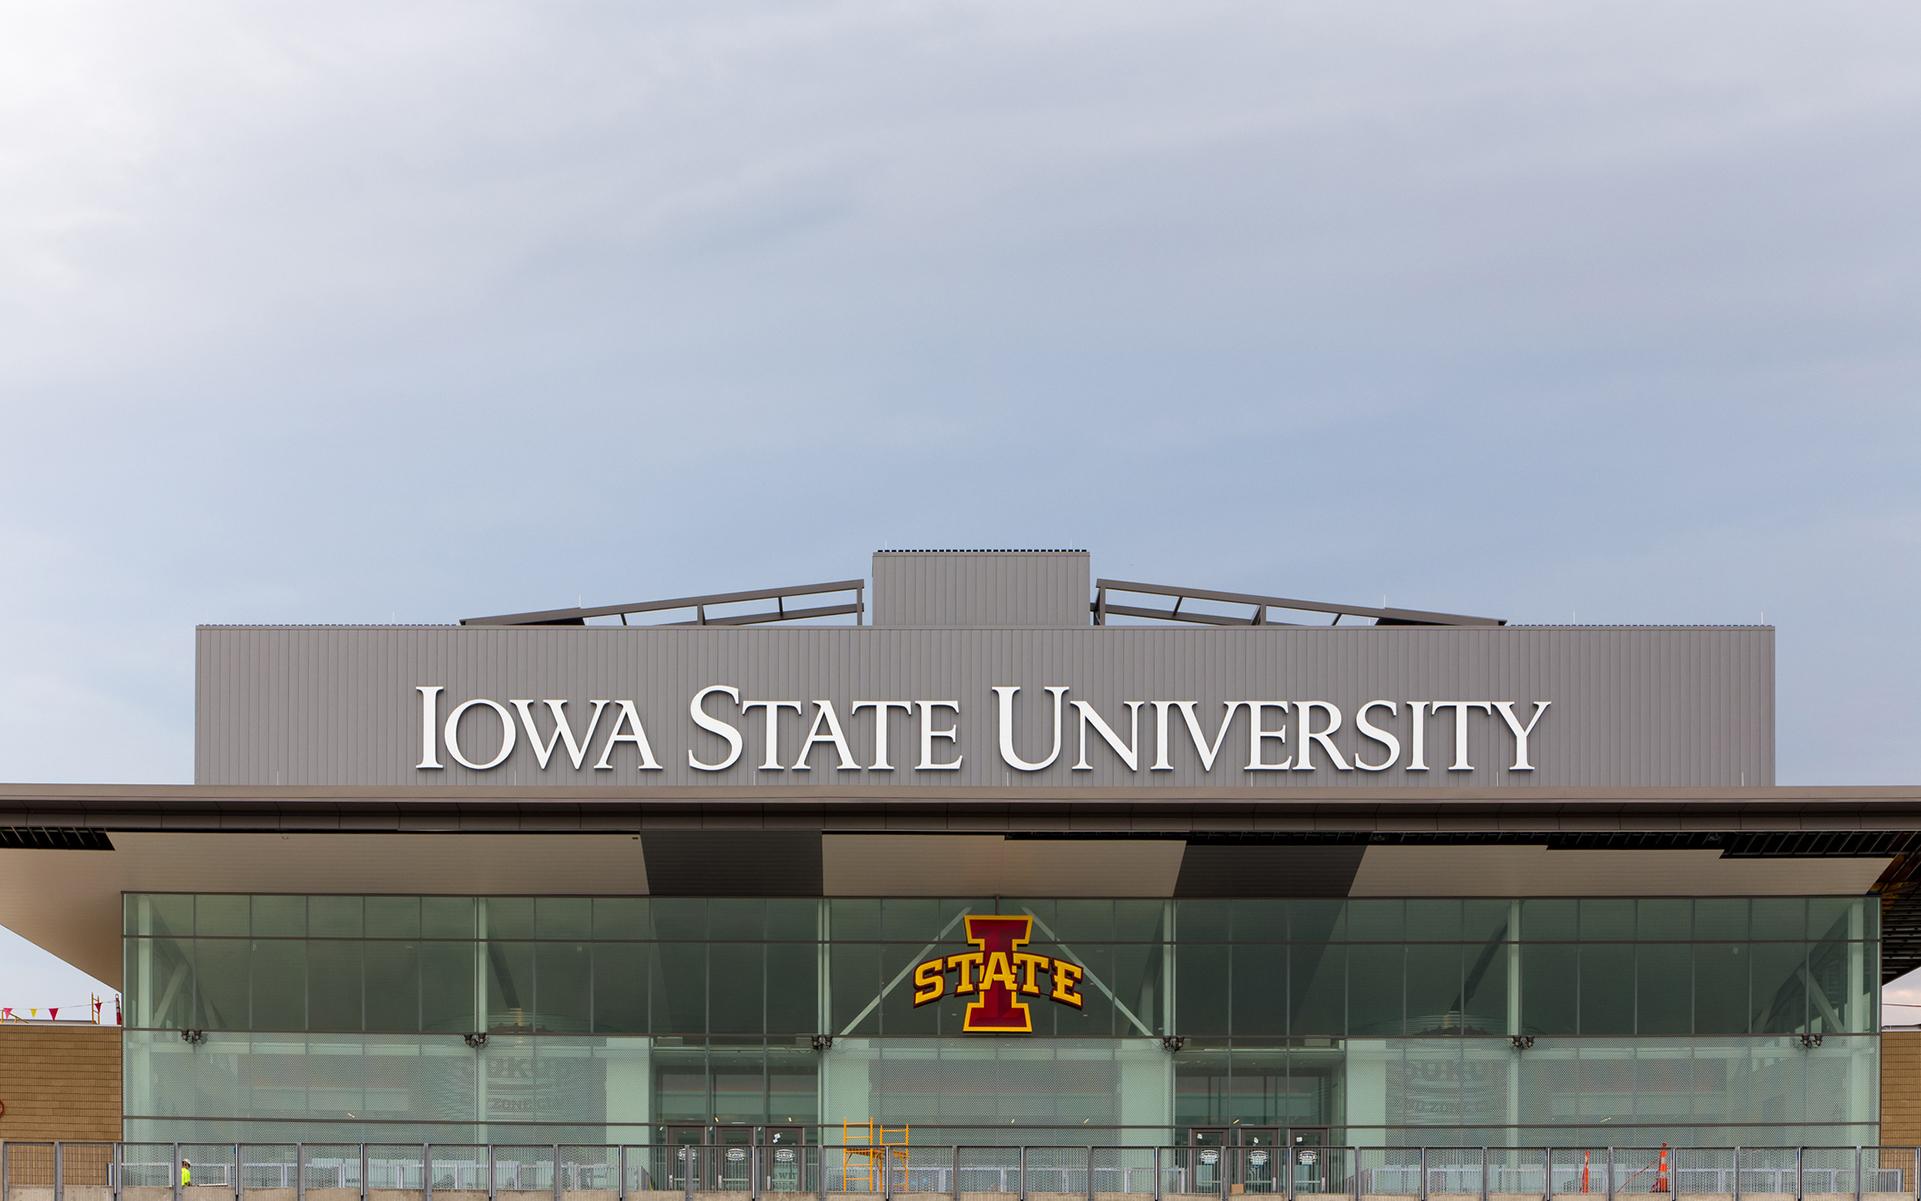 Iowa state university - Iowa State University 53